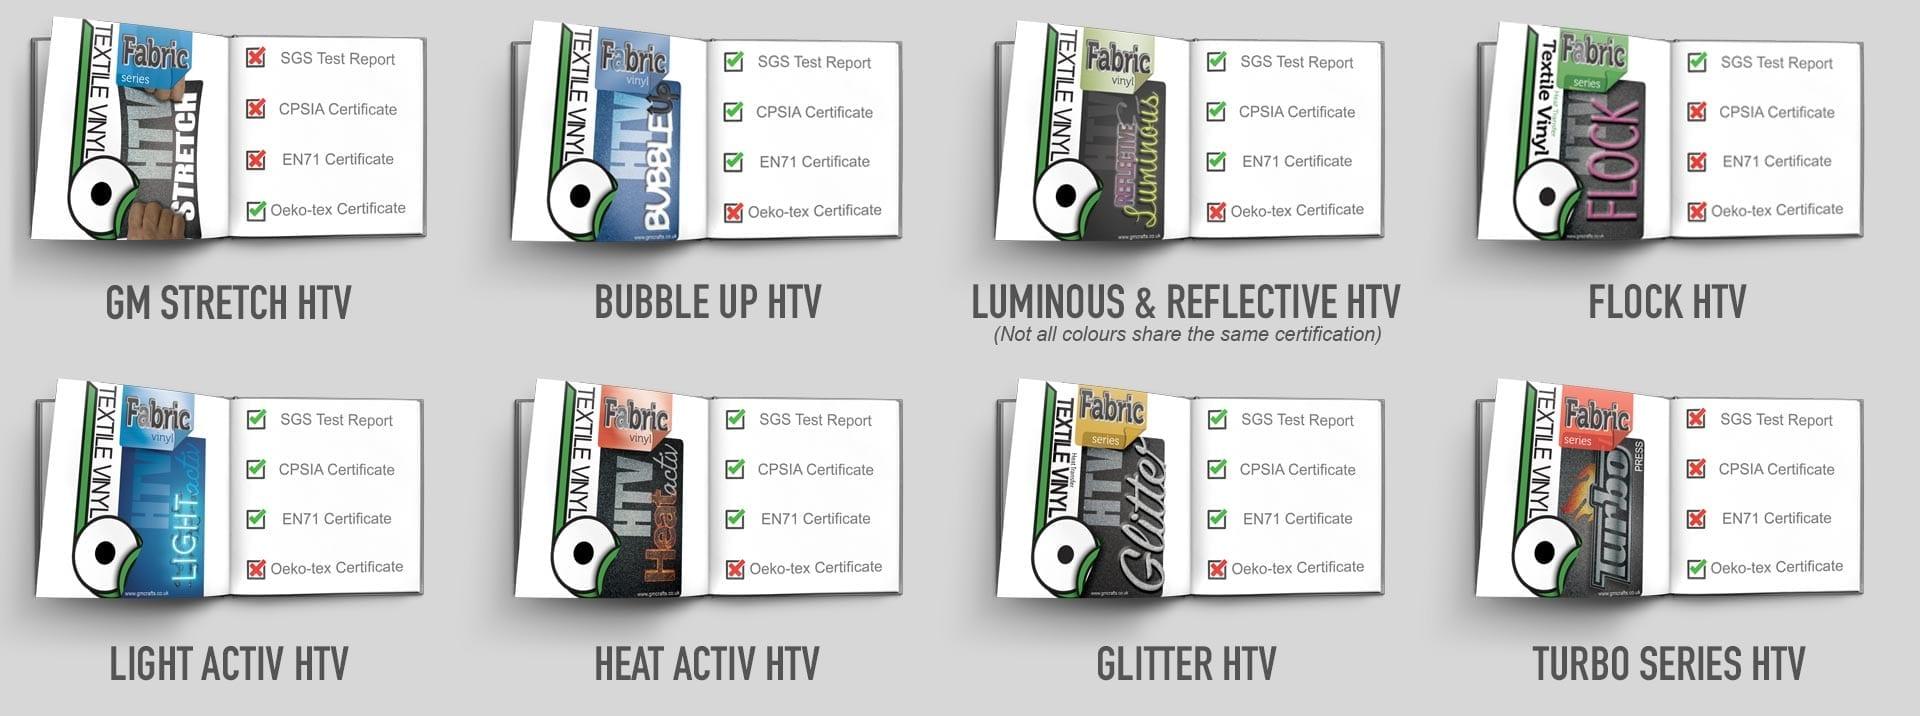 Desktop-HTV-Certificates-2